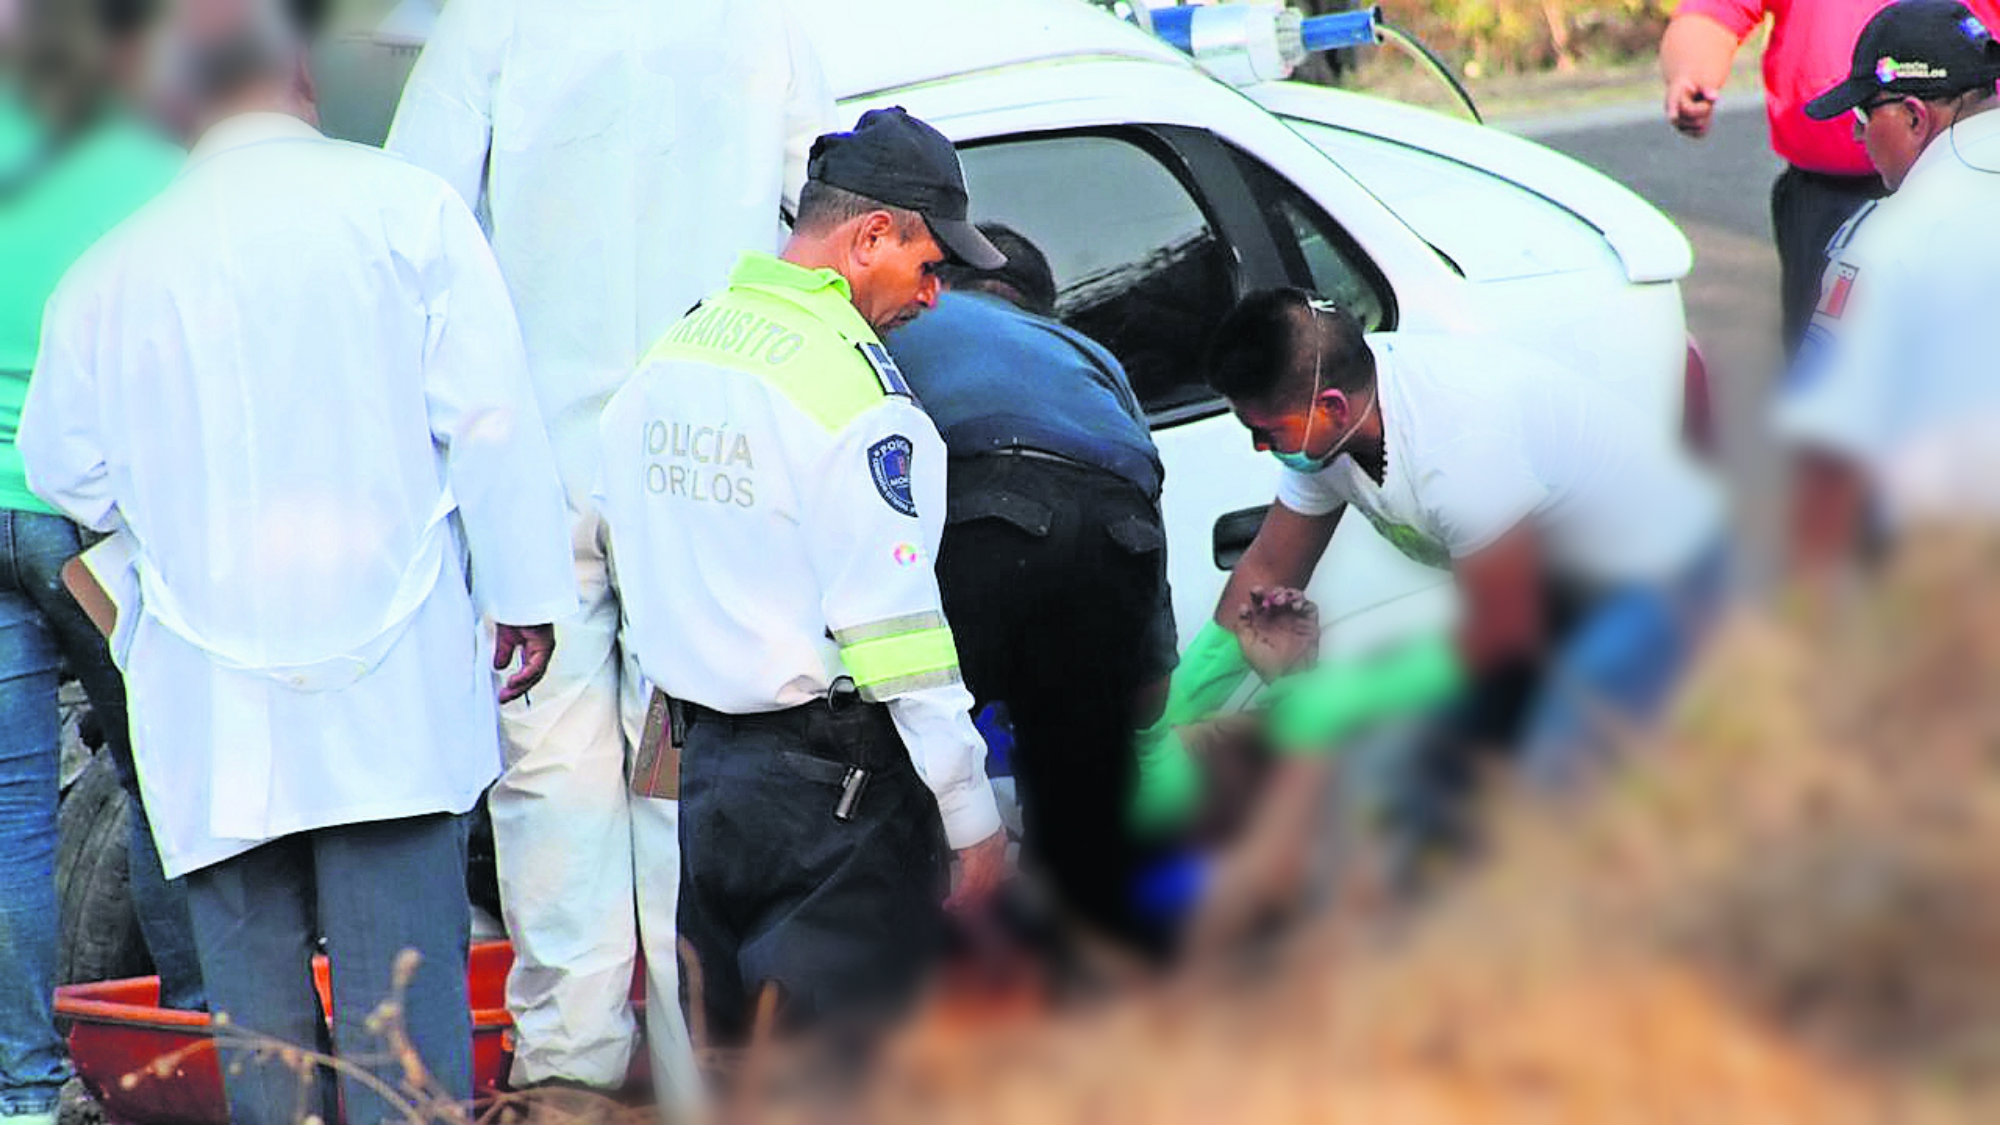 Temixco accidente quedan enlatados muere pareja por invadir carril chocan con camioneta